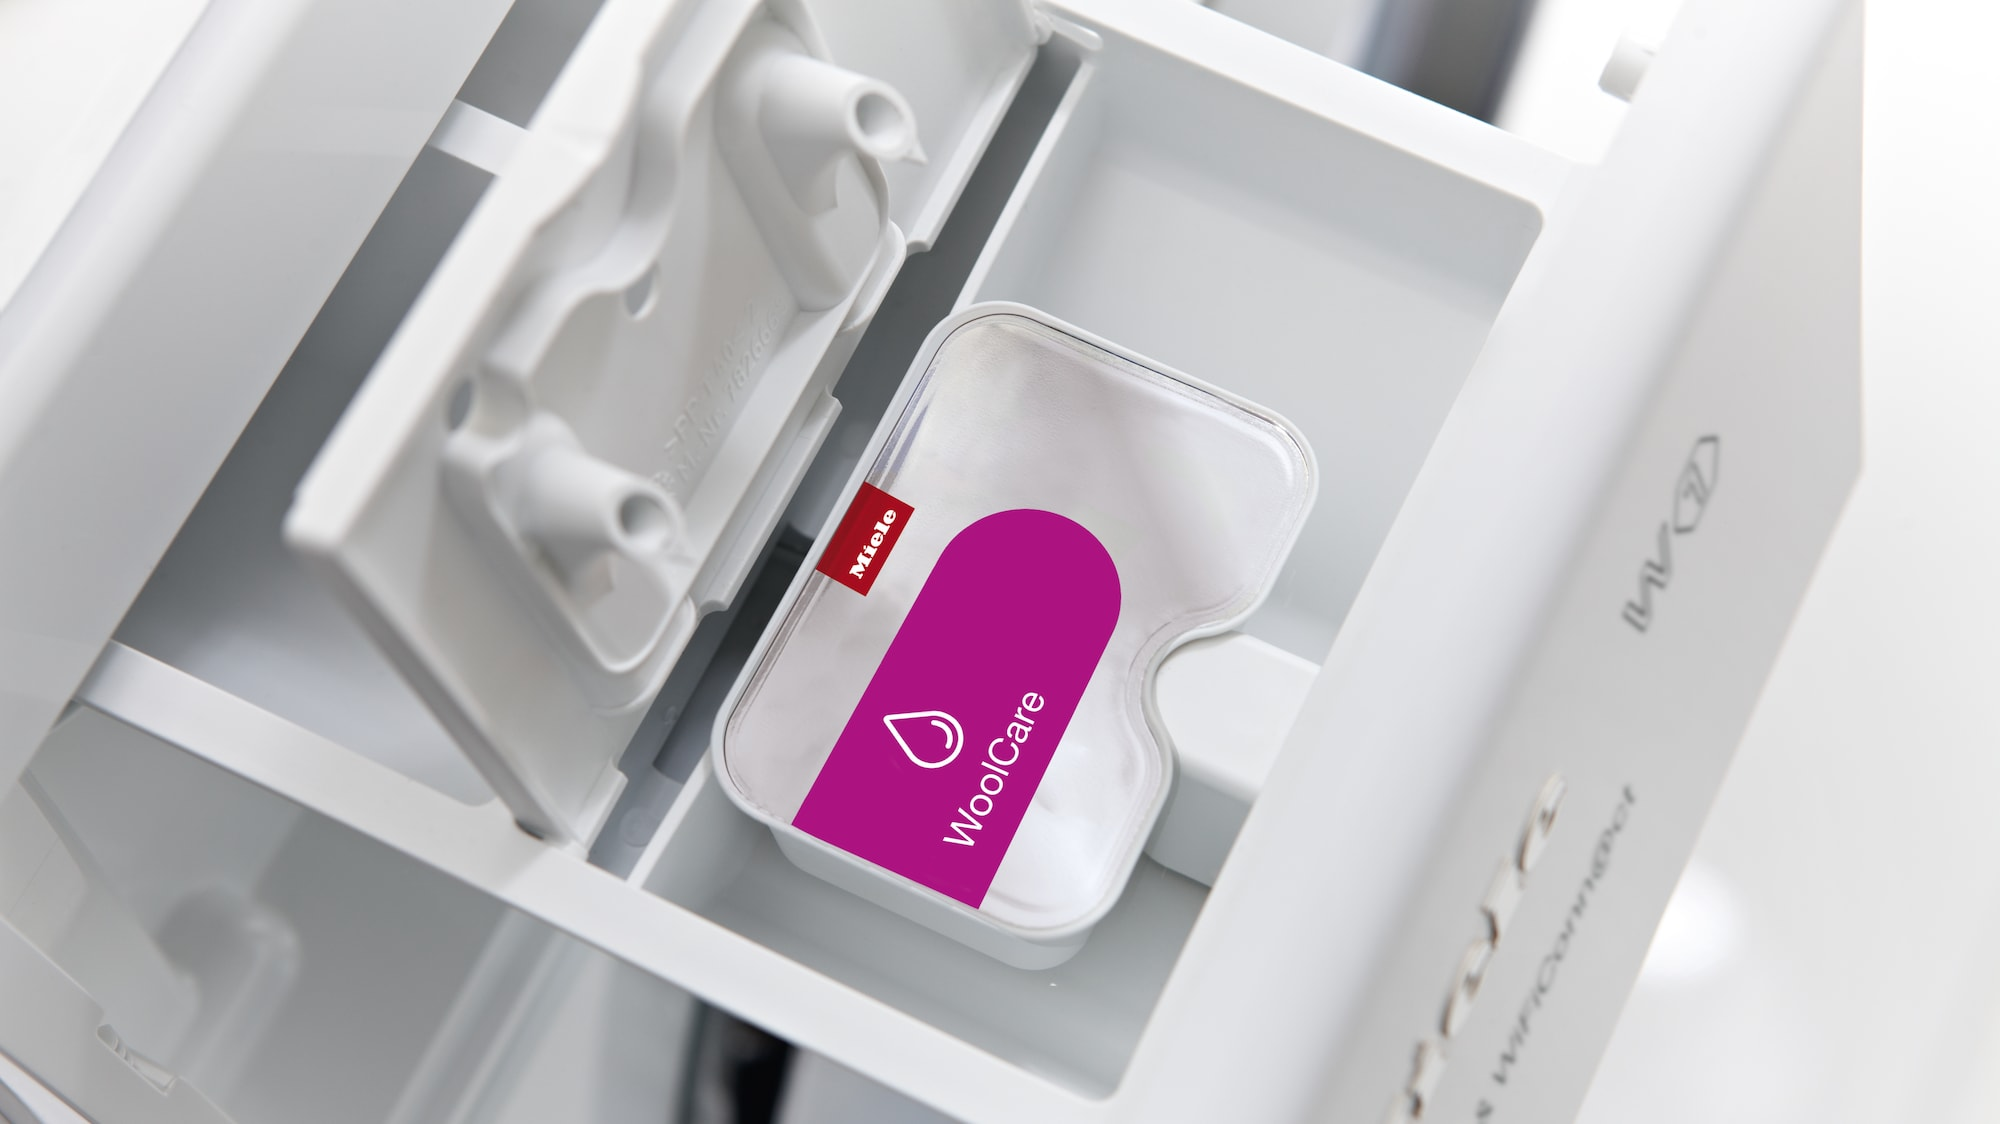 CapDos Laundry Detergent